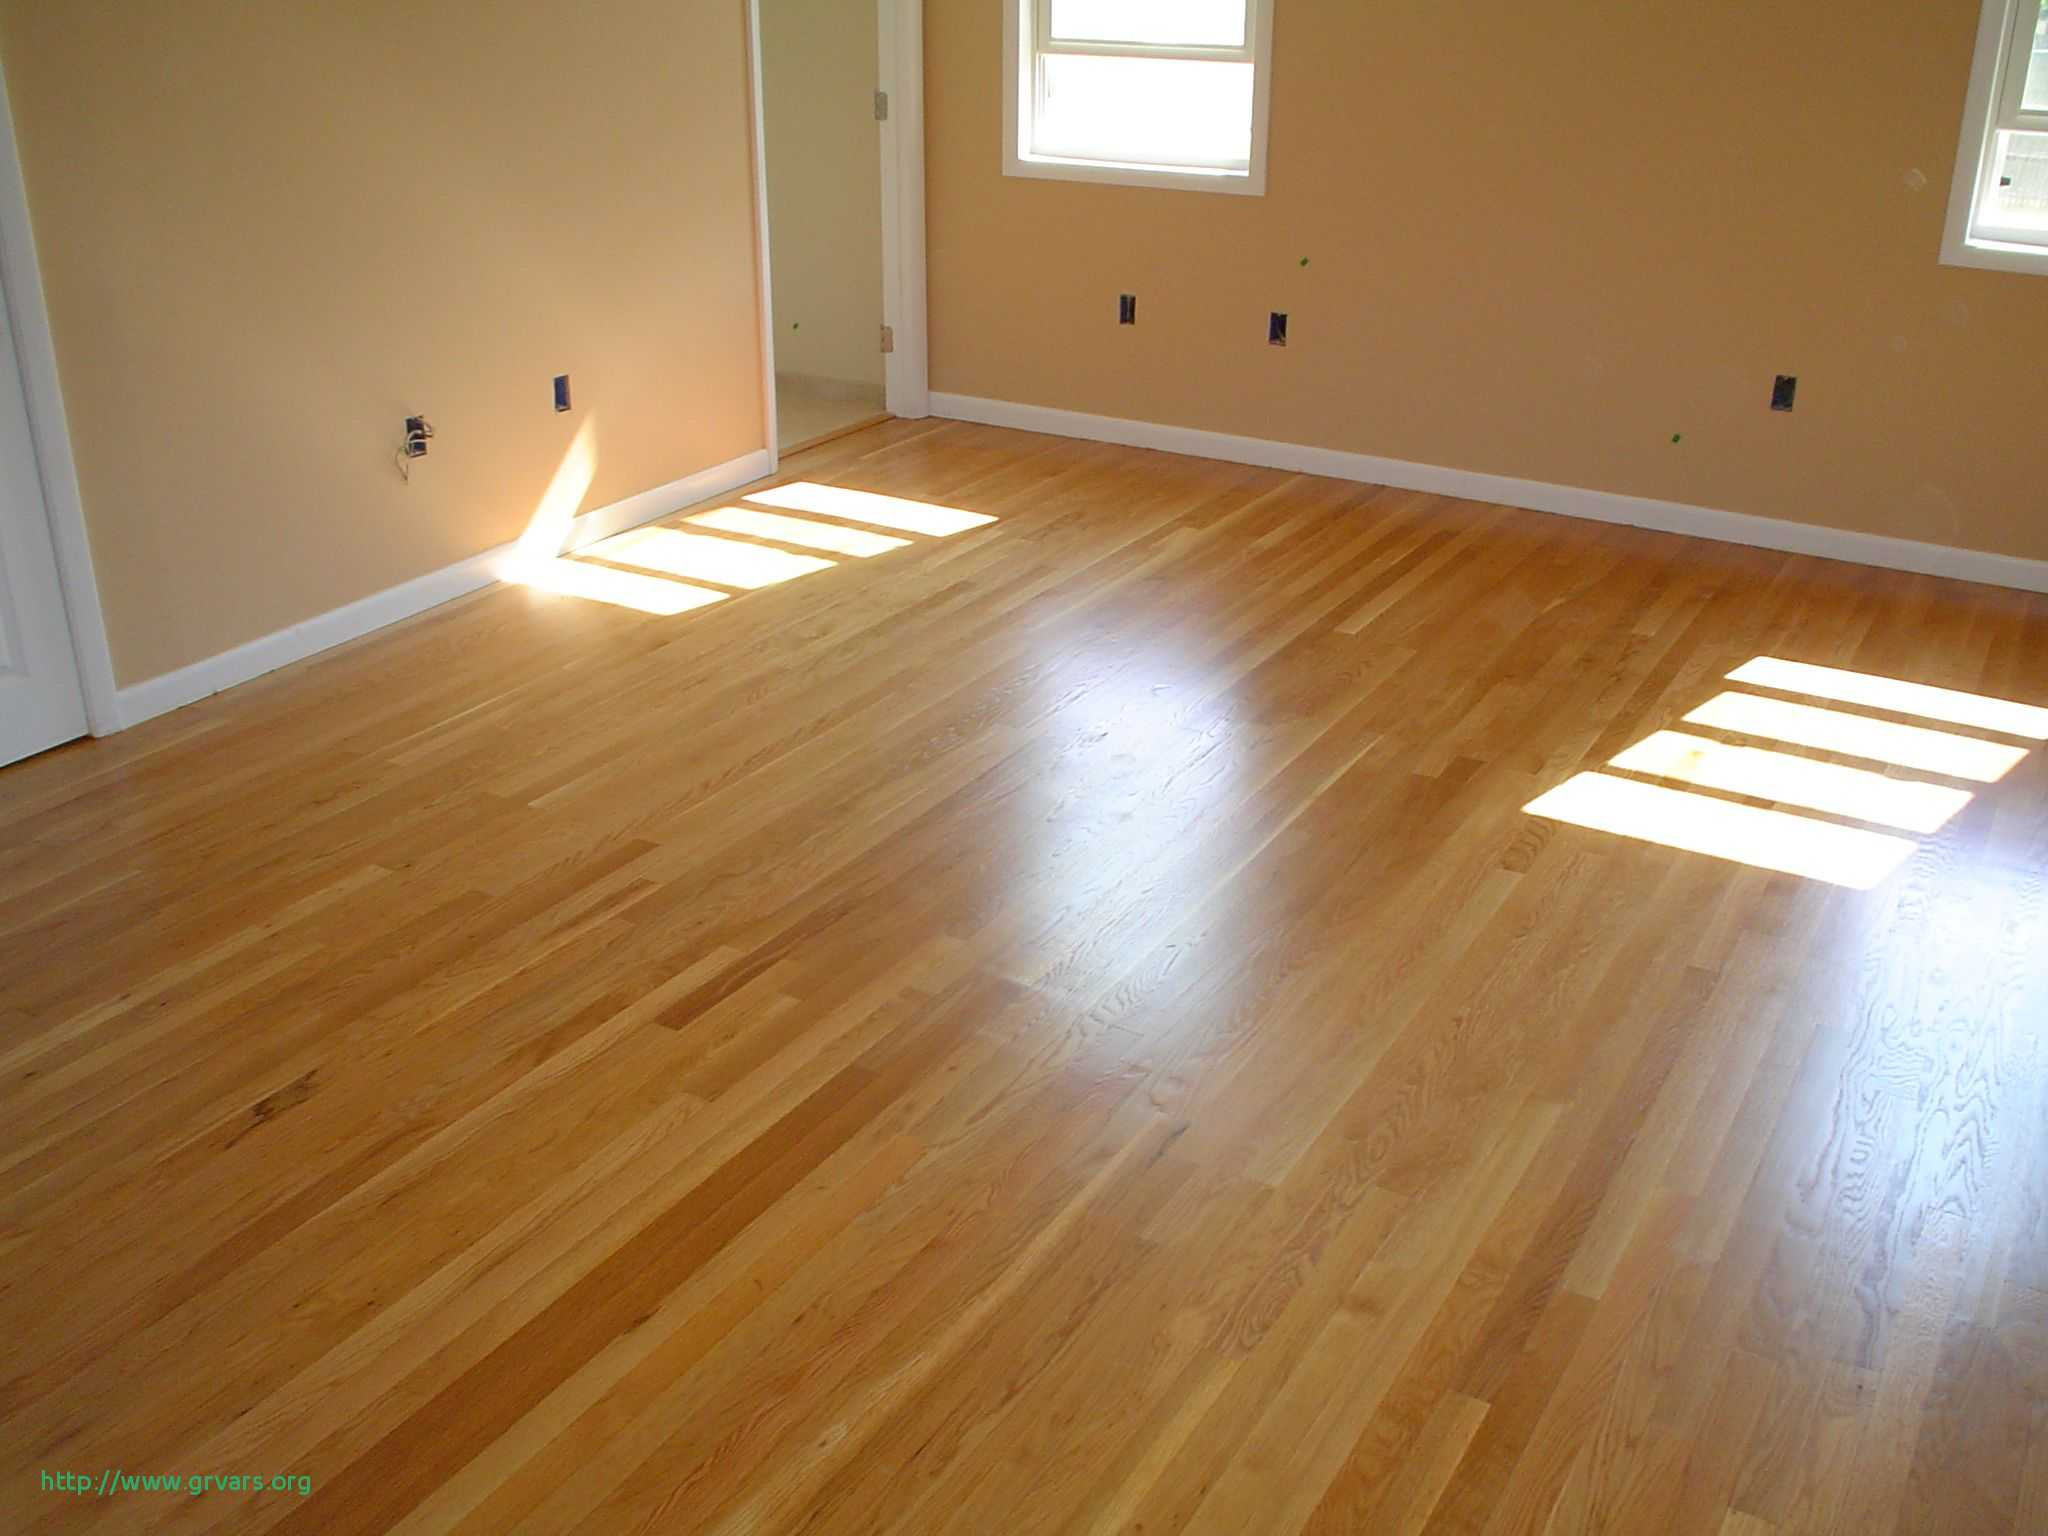 minwax hardwood floor stain of country white floor stain unique minwax golden oak on oak paint in country white floor stain unique minwax golden oak on oak paint pinterest